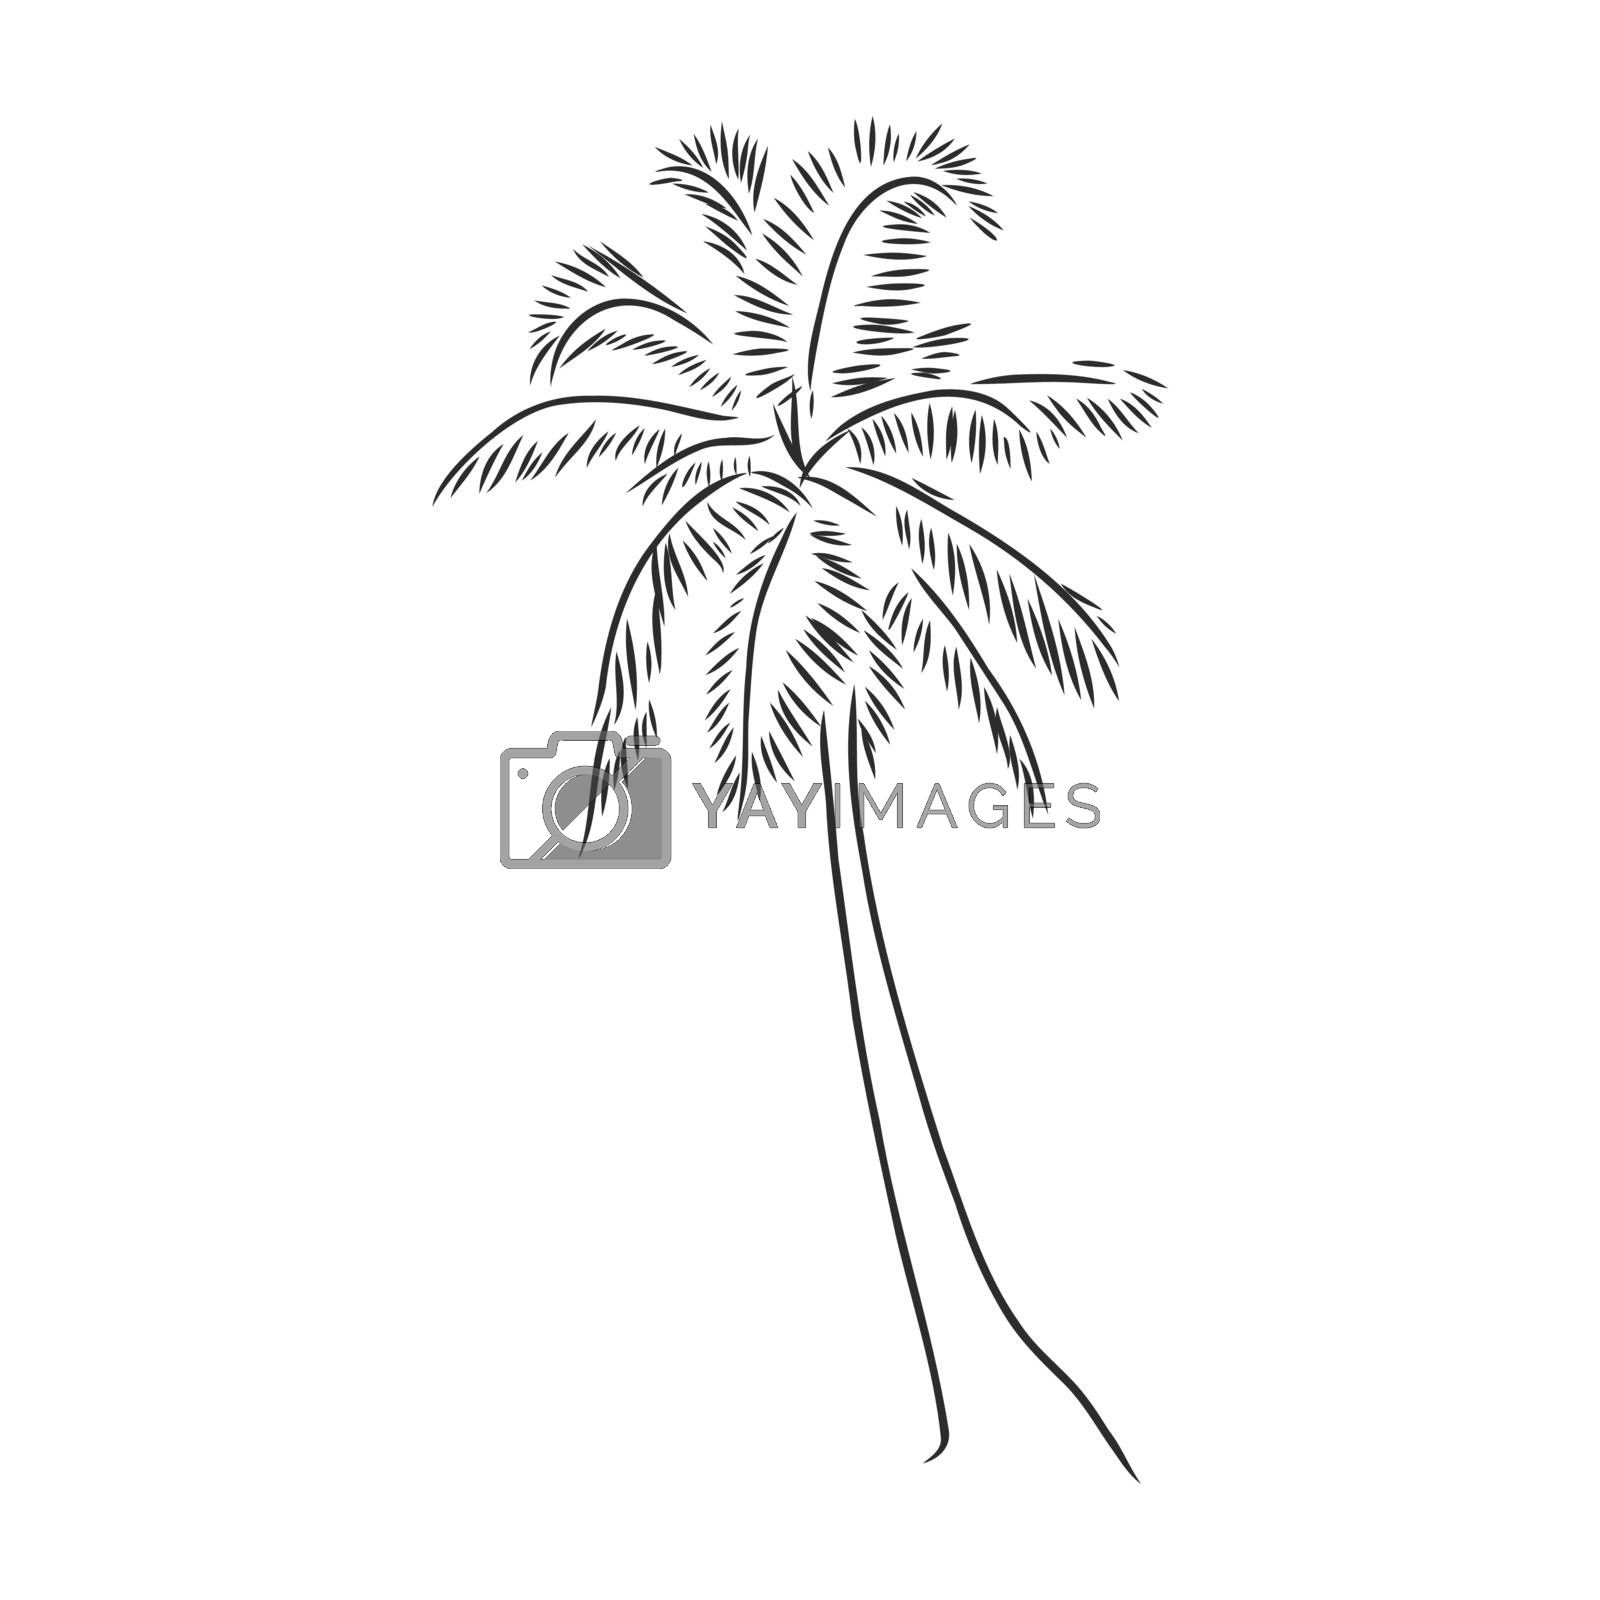 Hand drawn palm tree